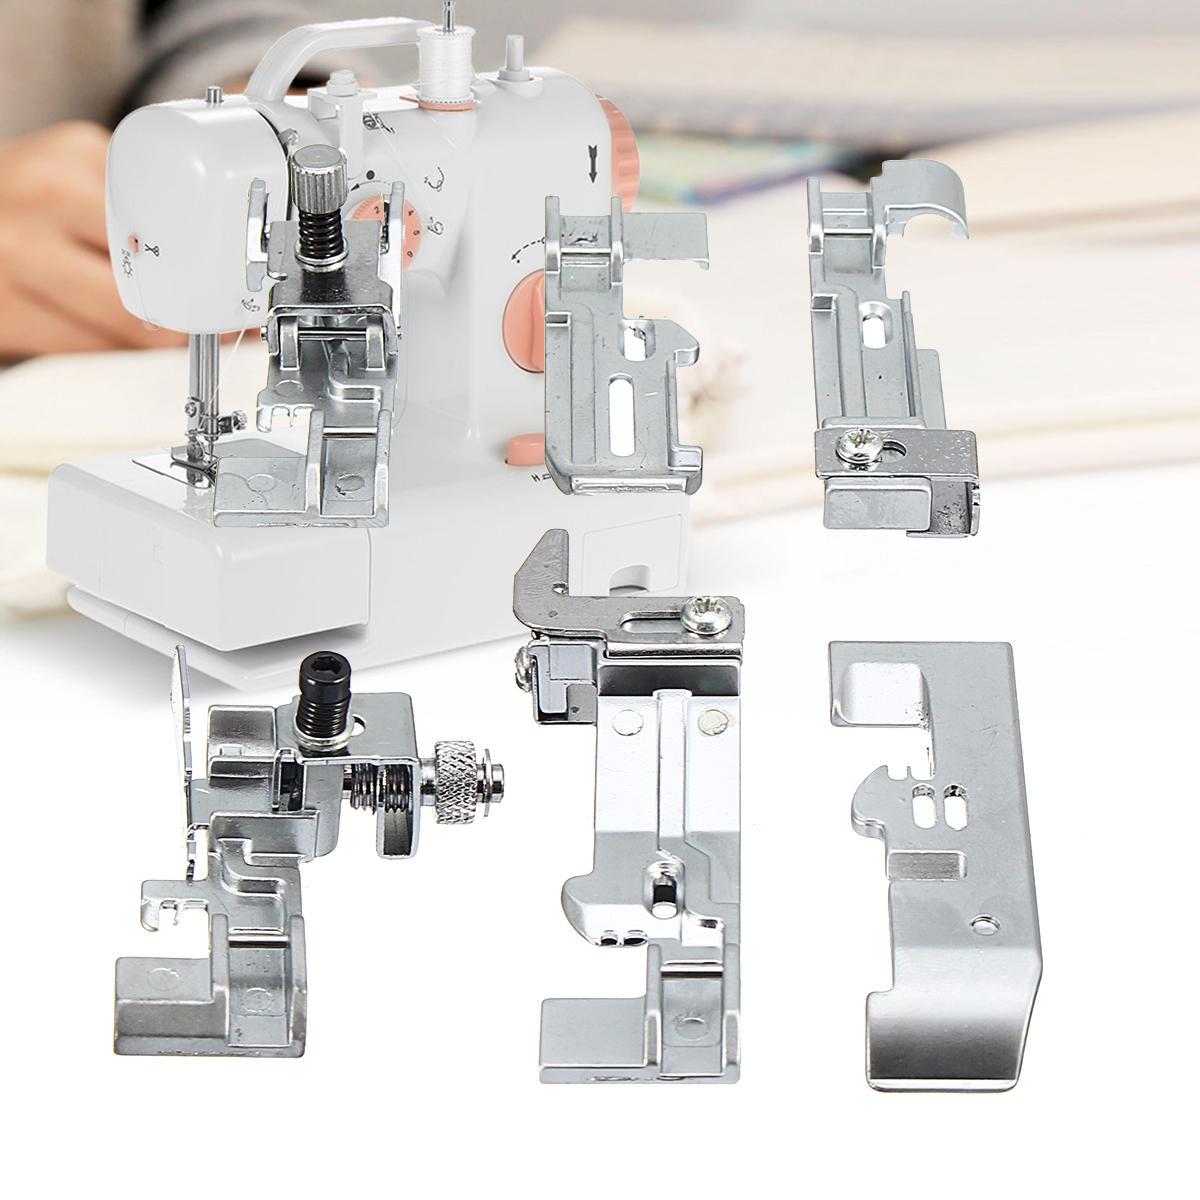 6pcs Presser Optional Overlock Feet Foot Pack for Juki Lock MO-50E MO-51E Sewing Tools